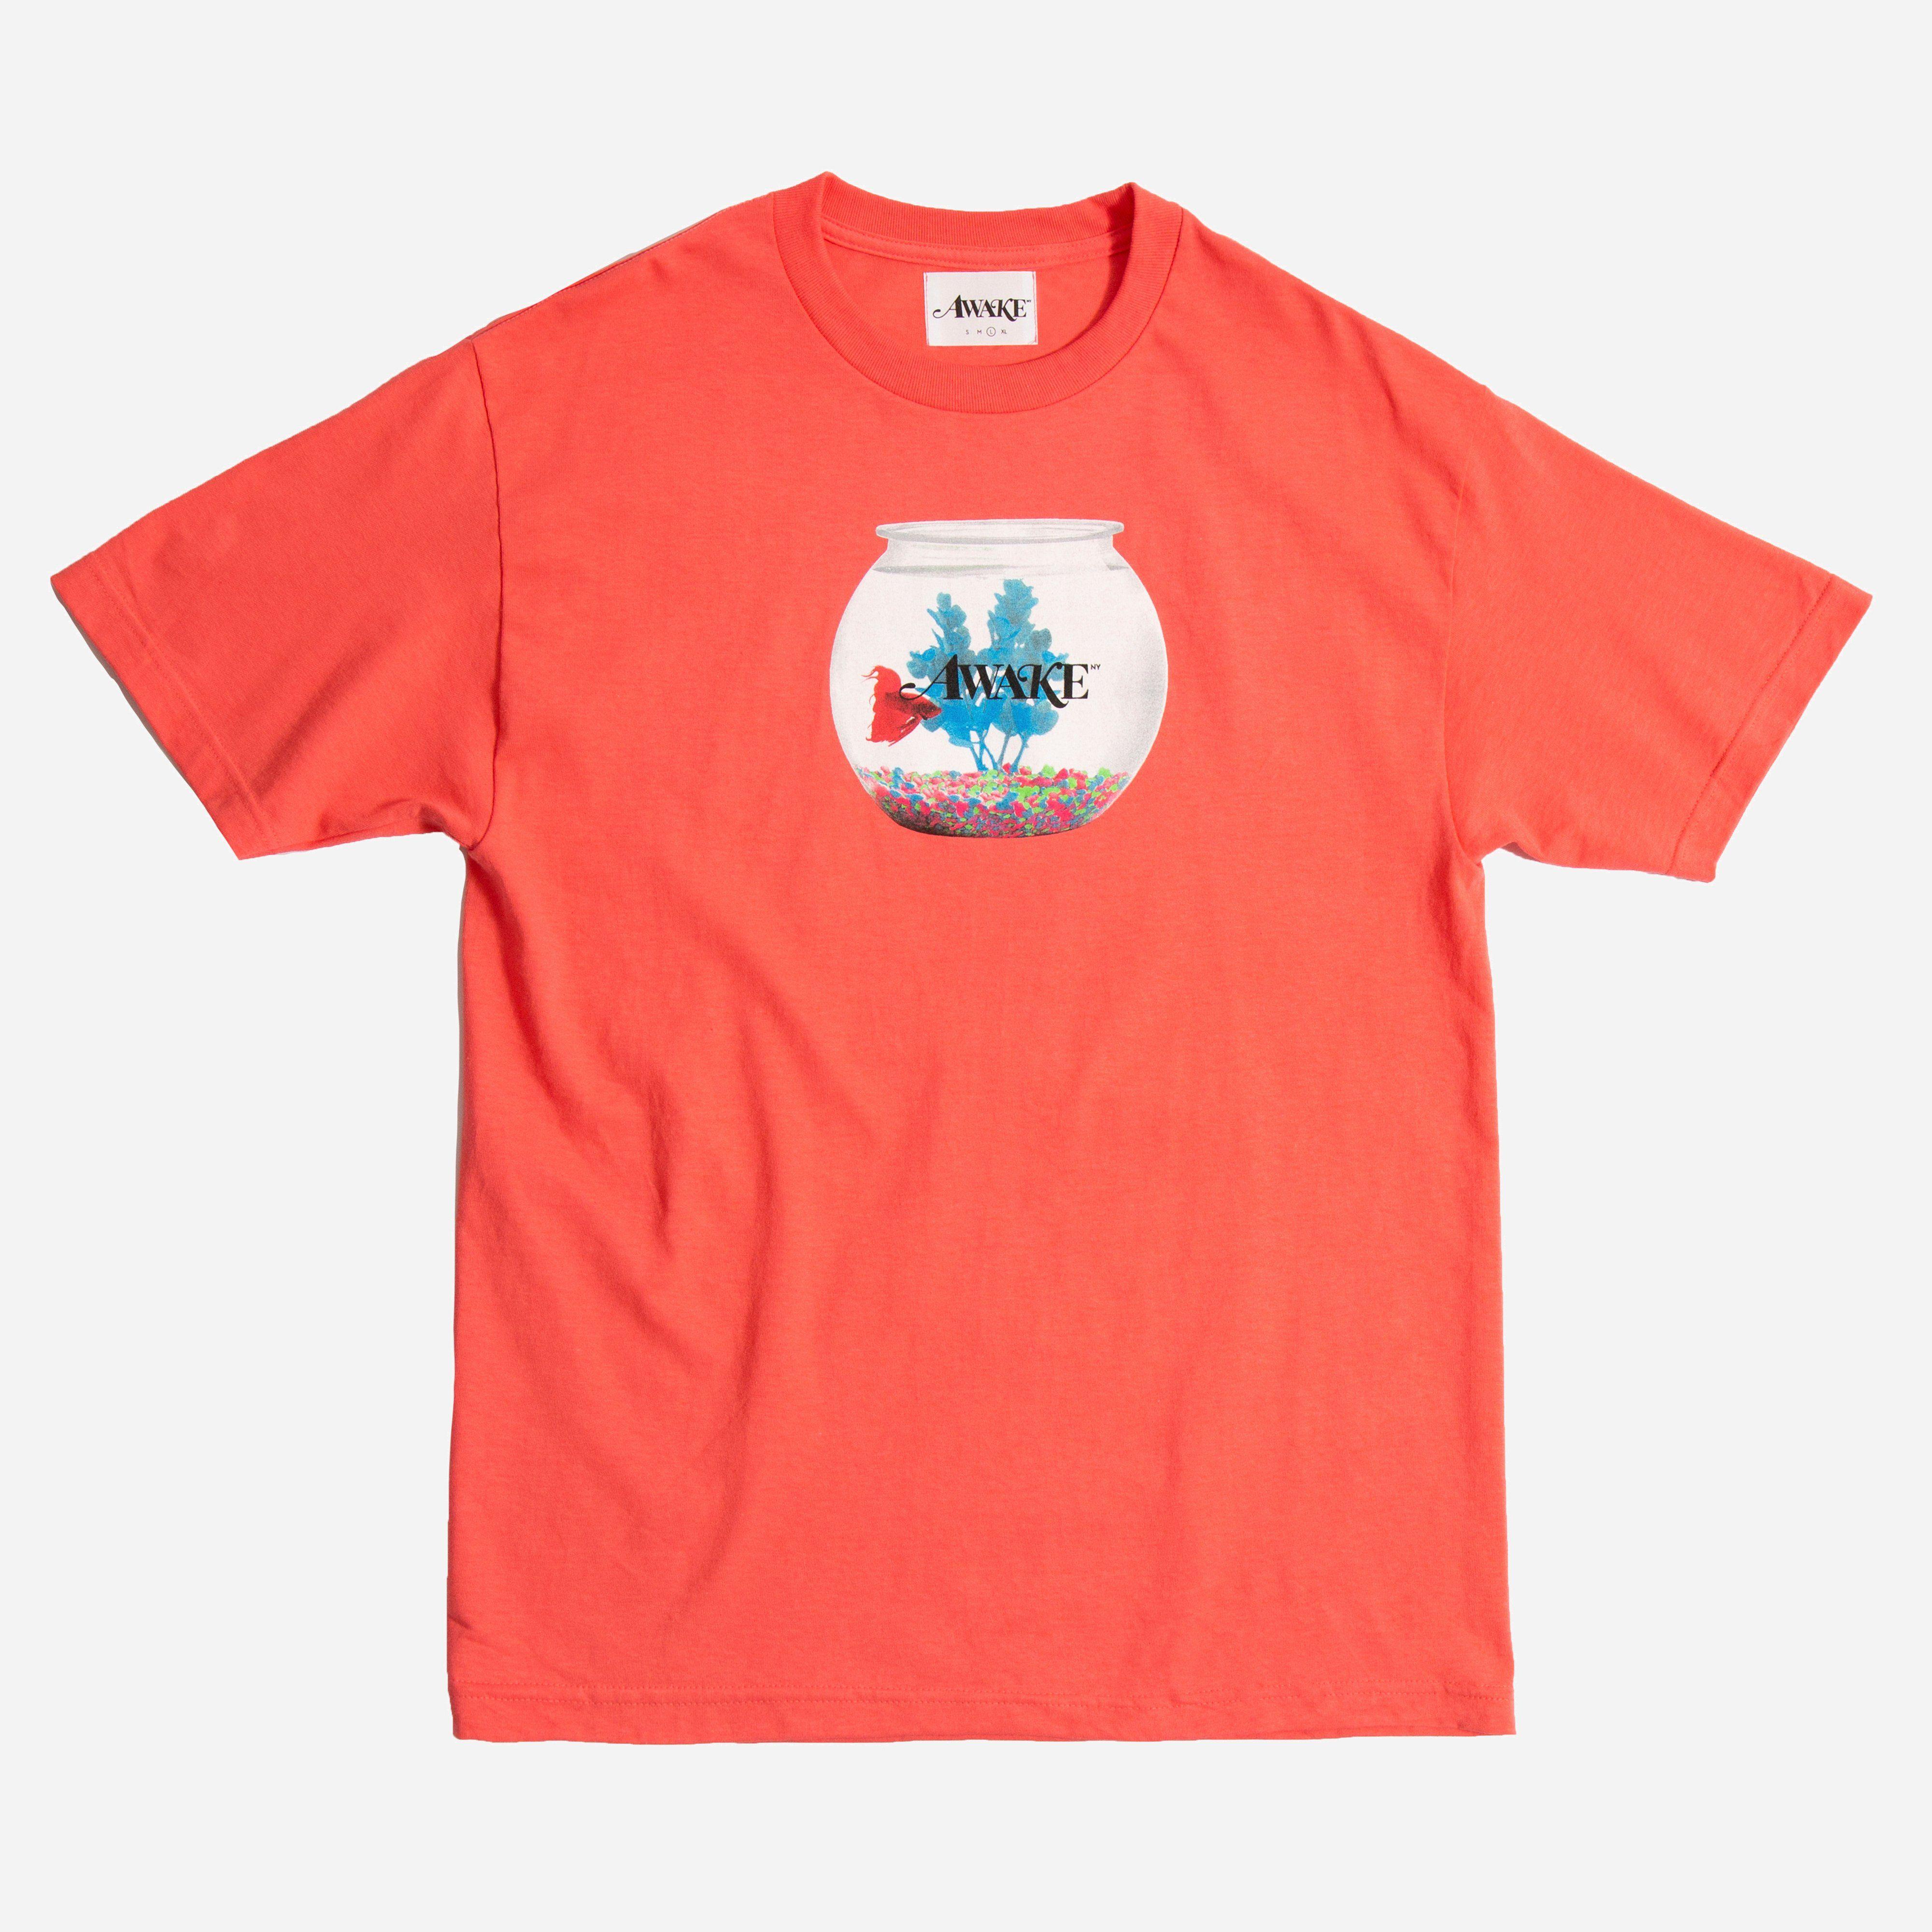 Awake NY Fish Bowl T-shirt